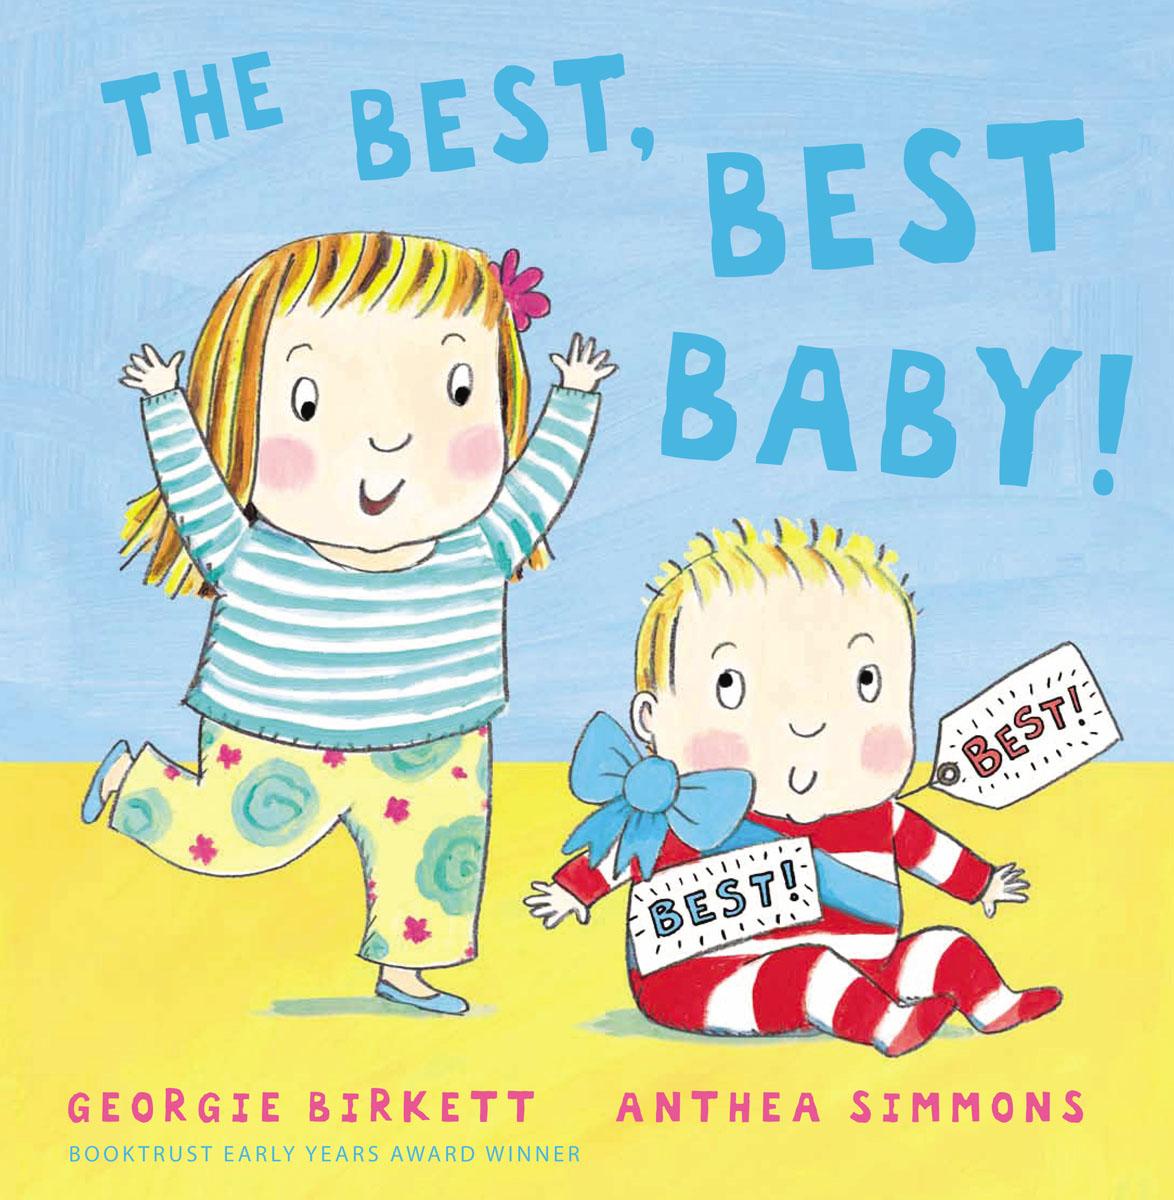 The Best, Best Baby!